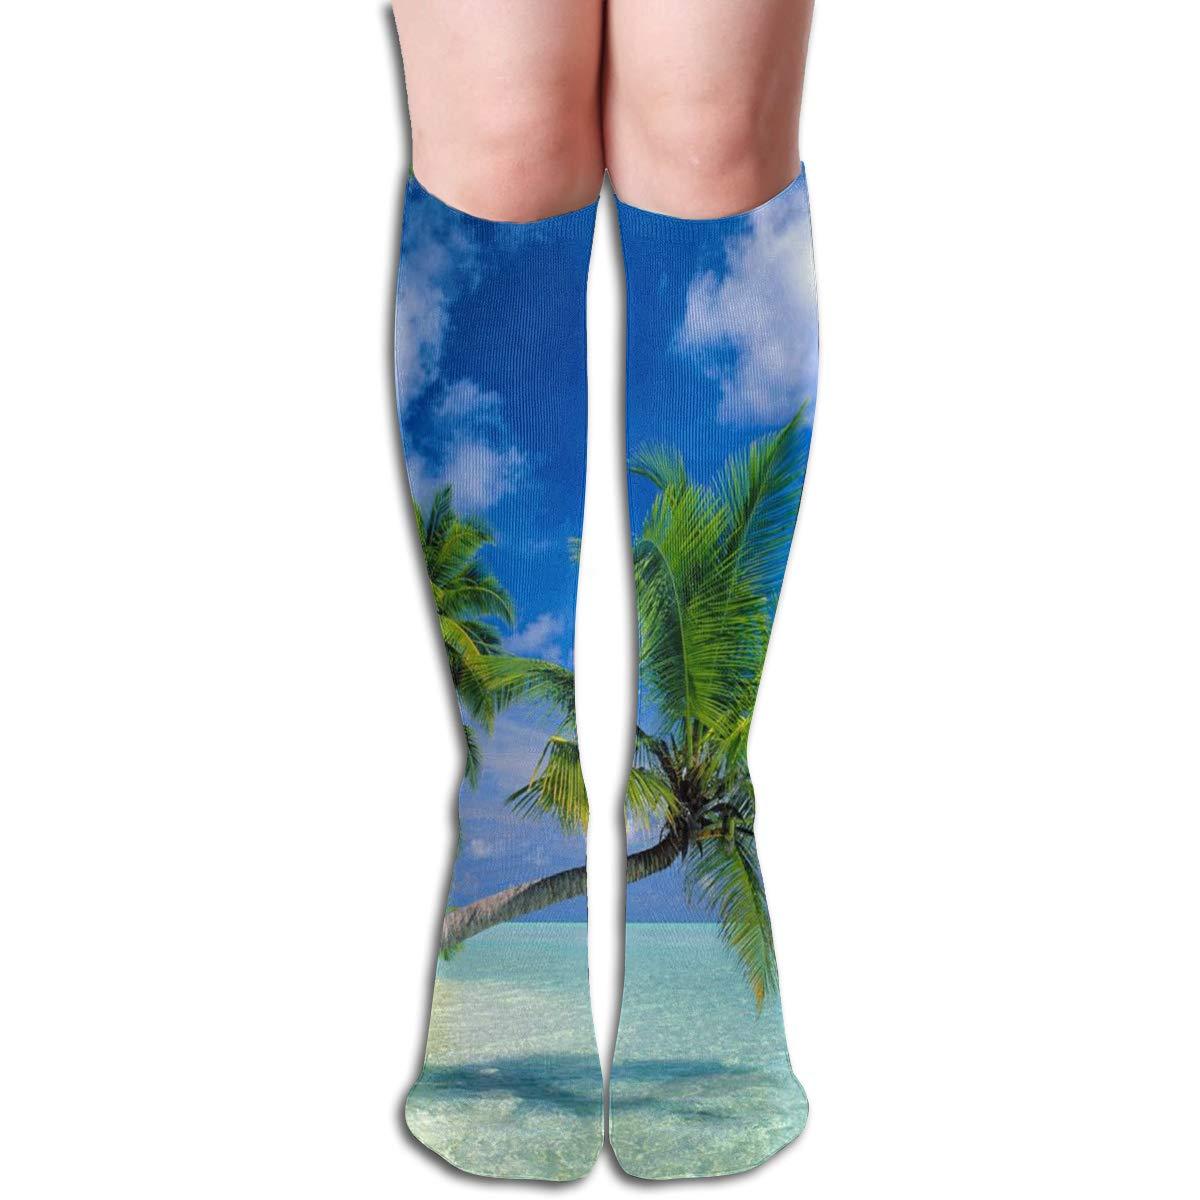 Women Socks Over Knee Flip Flop Seaside Winter Warmth Special For Decor